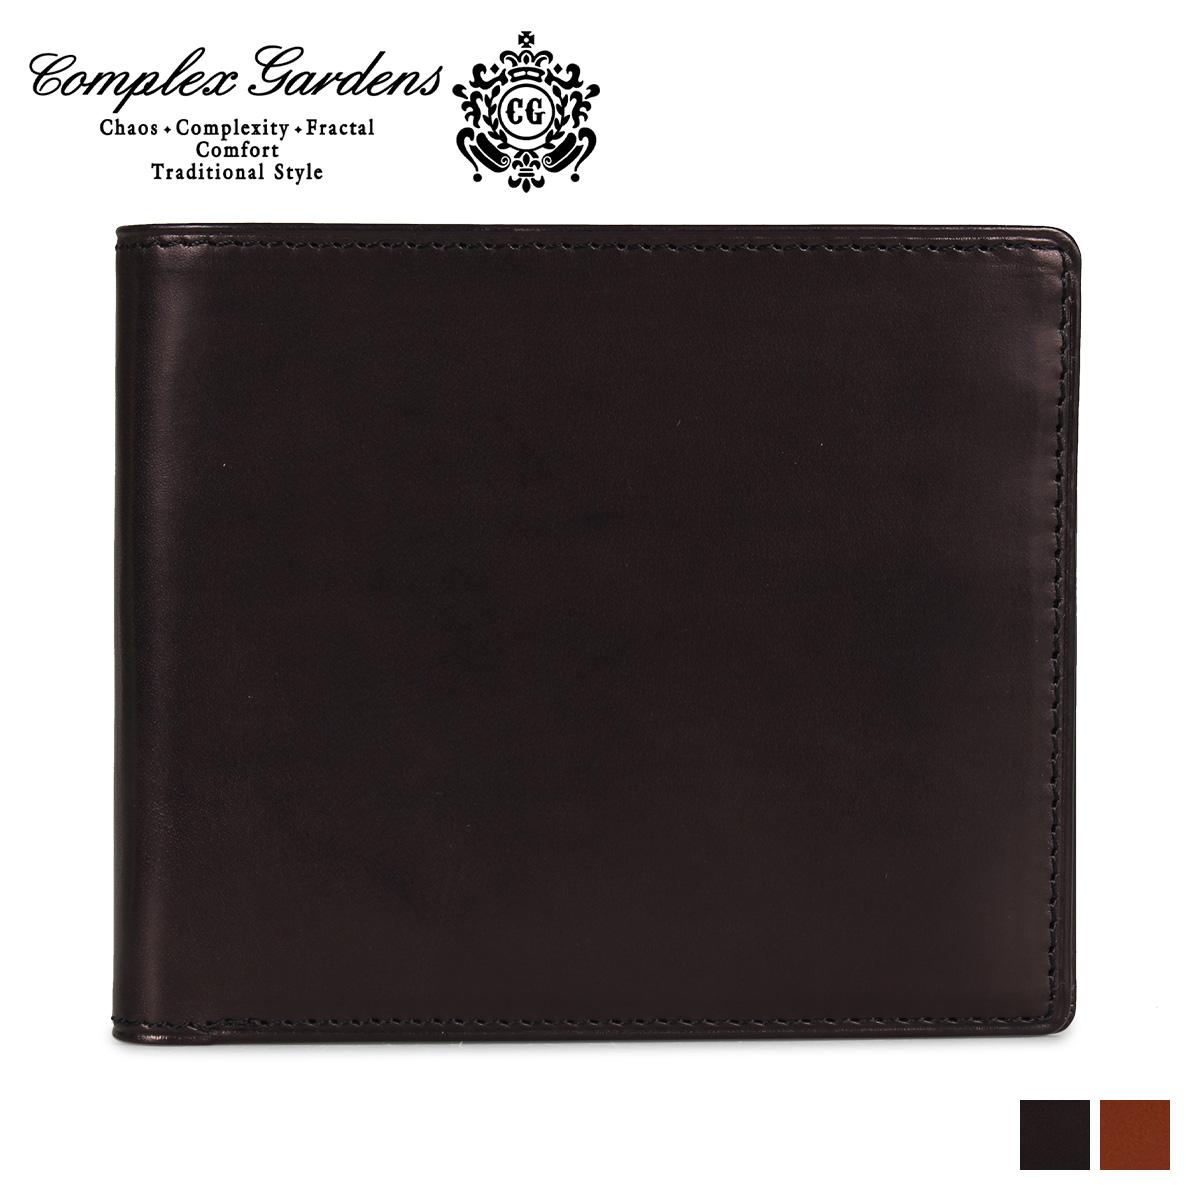 COMPLEX GARDENS コンプレックスガーデンズ 財布 二つ折り メンズ 青木鞄 本革 GOUMA WALLET ブラック キャメル 黒 3972